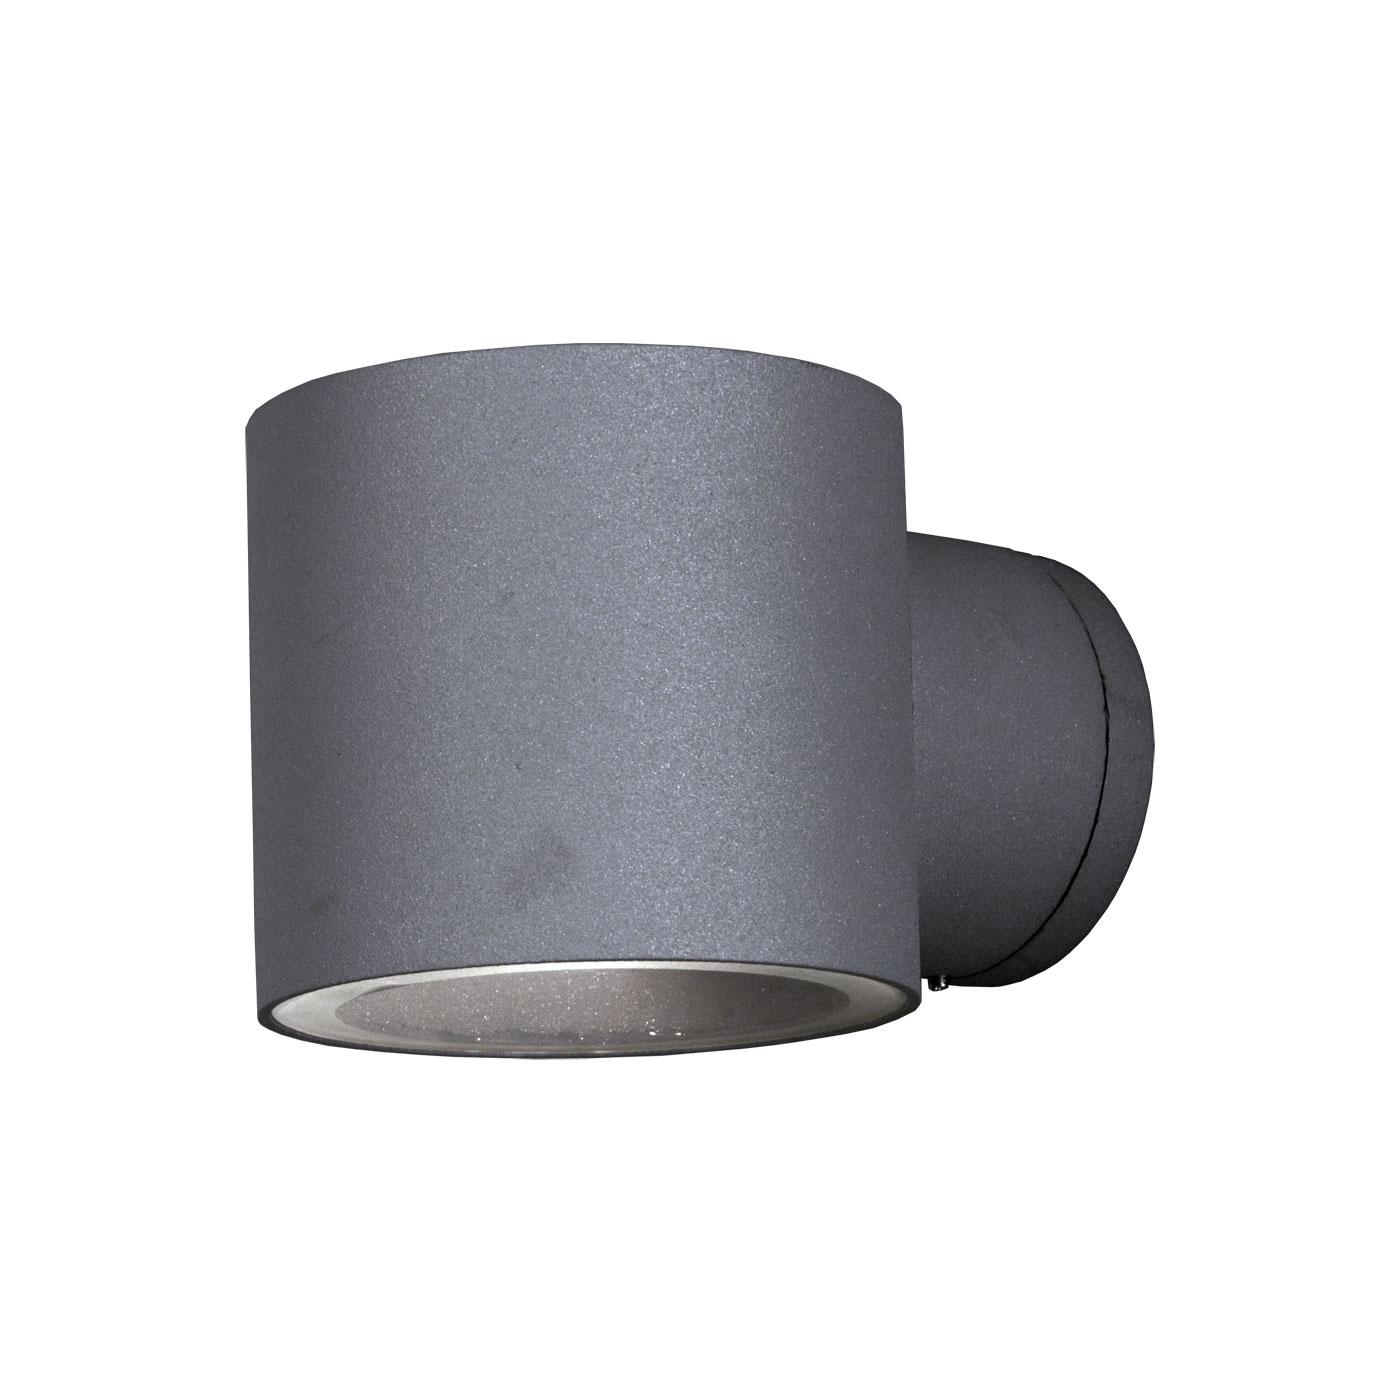 Aneta Ekerum Rund Utelampa Vägg Silvergrå